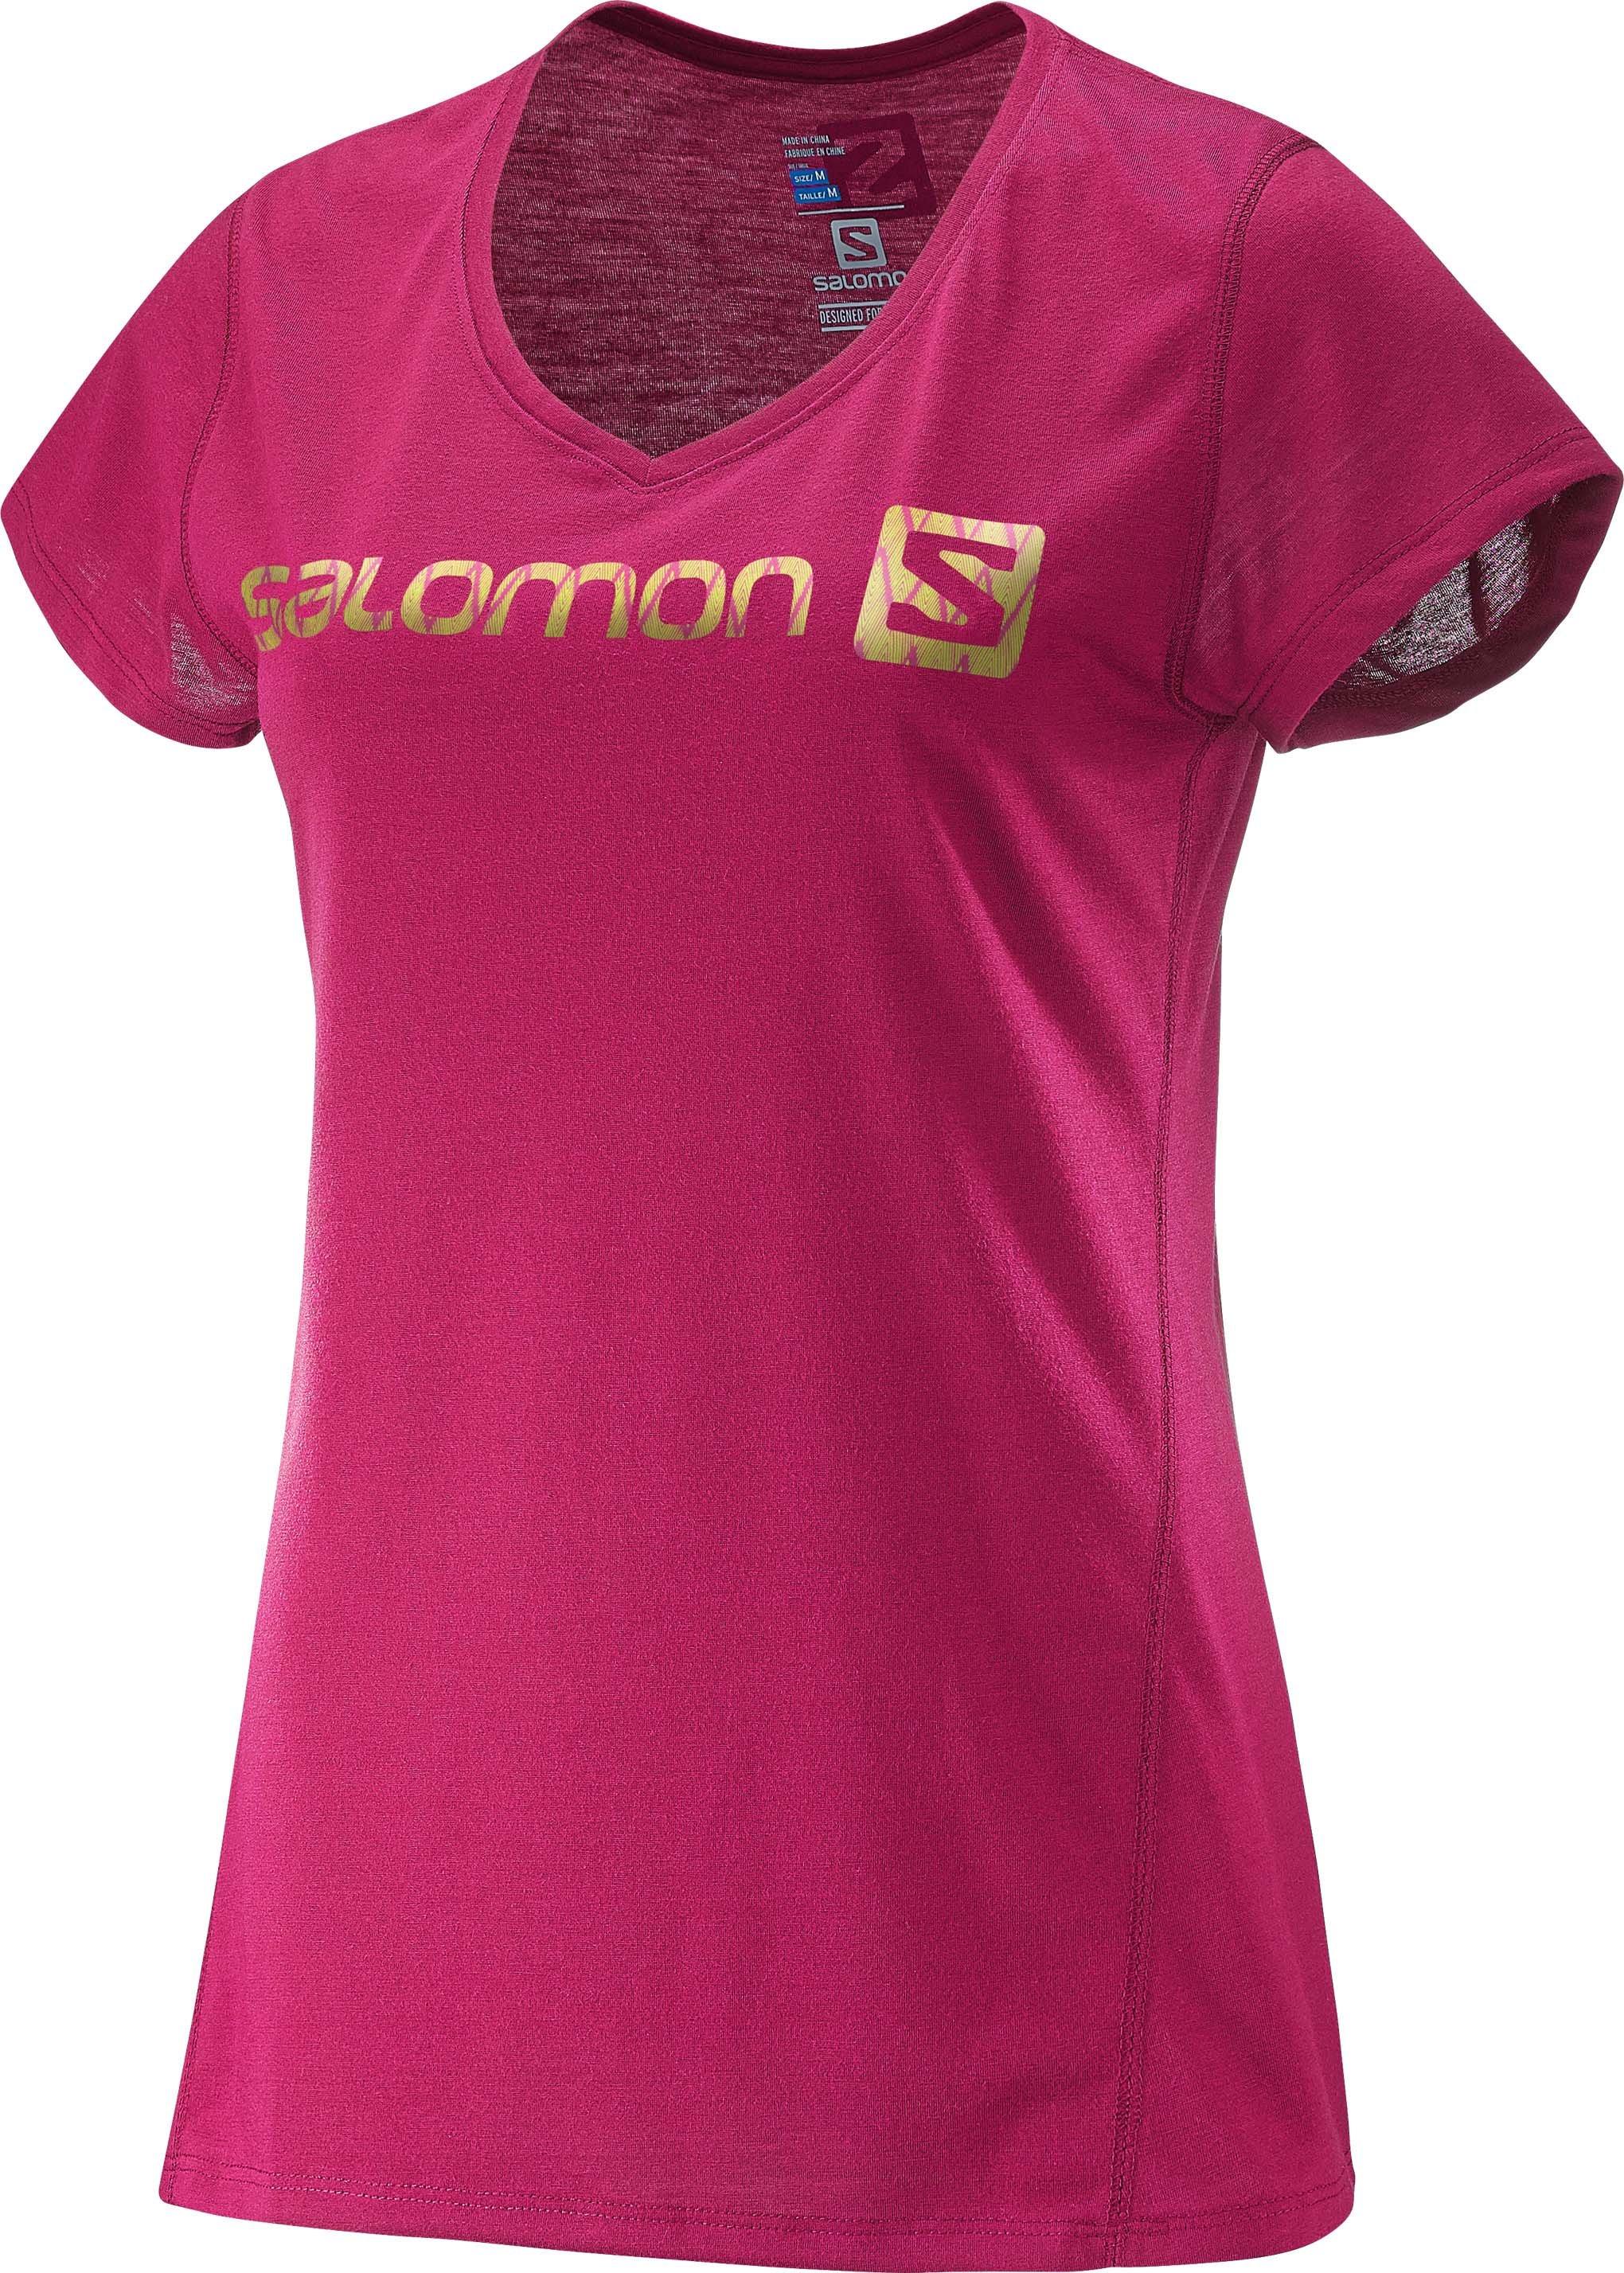 Běžecké triko Salomon Elevate Tech